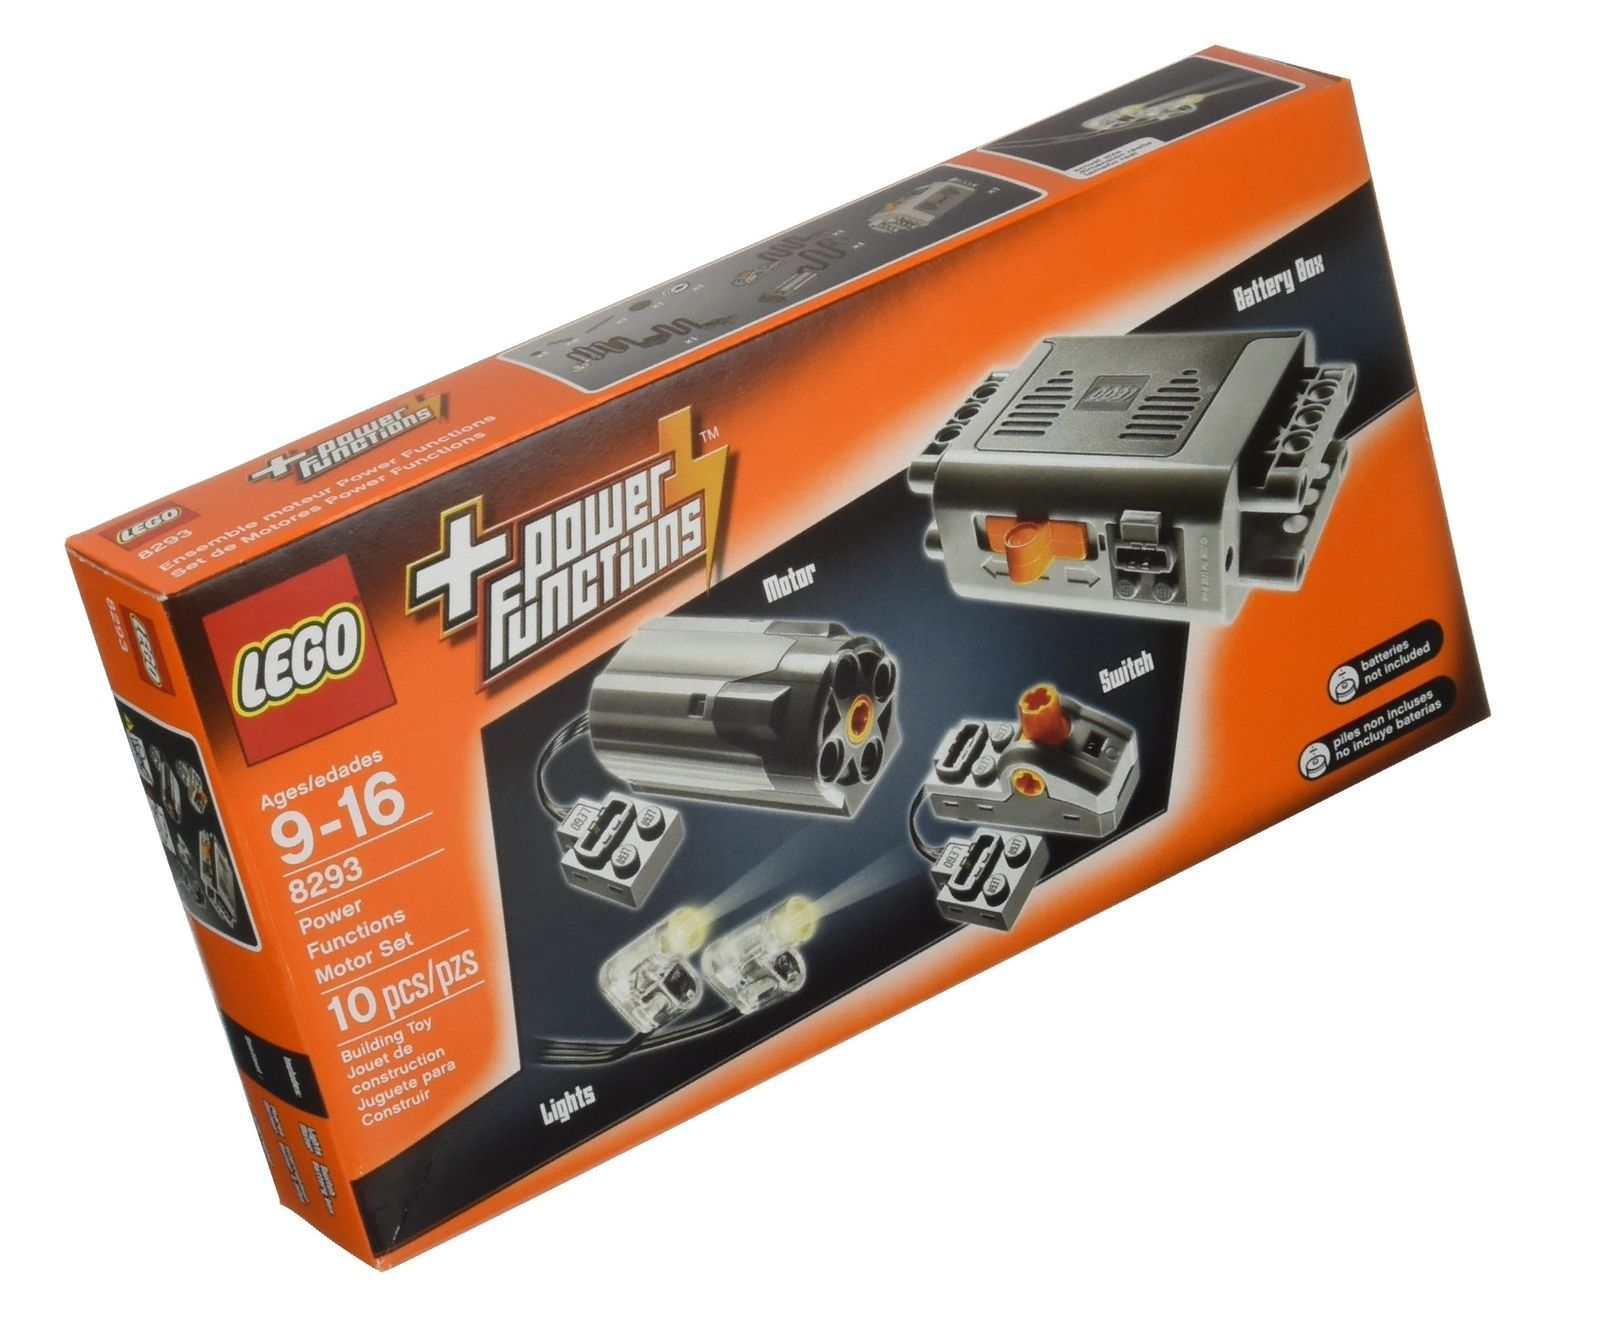 LEGO Technic 8293 Power Functions Motor Building Set [New]